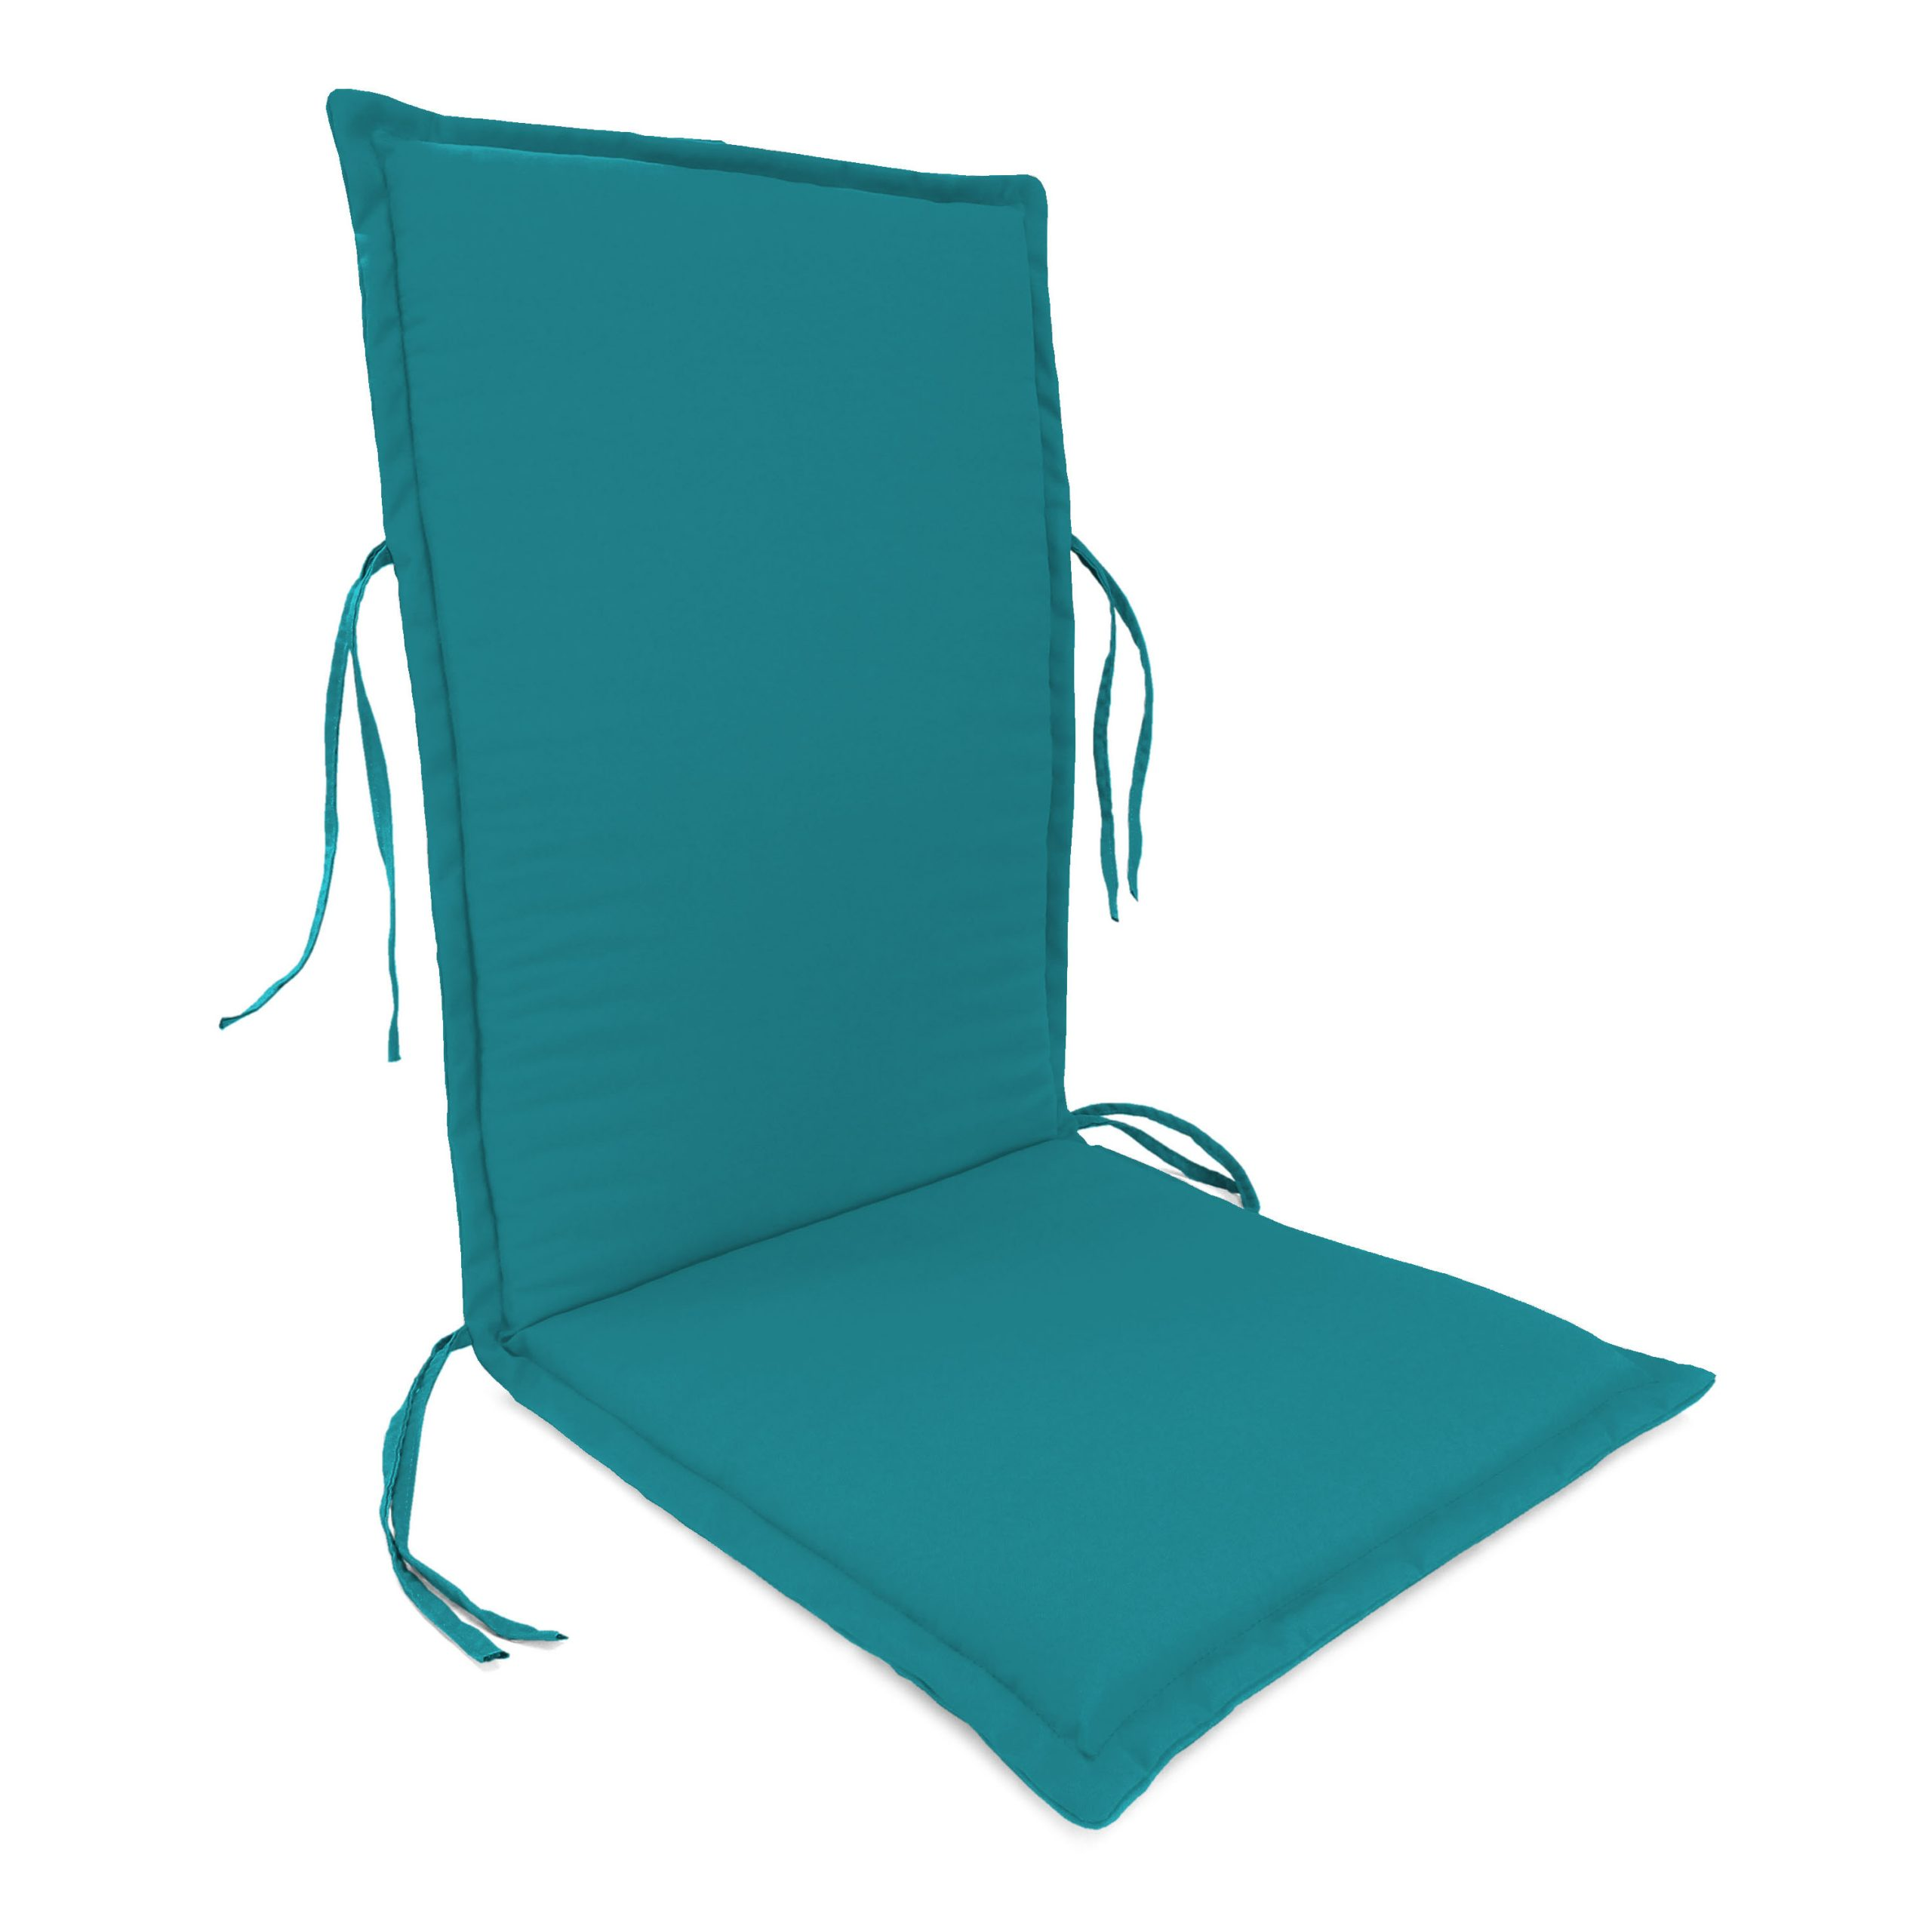 Cushion with Flange